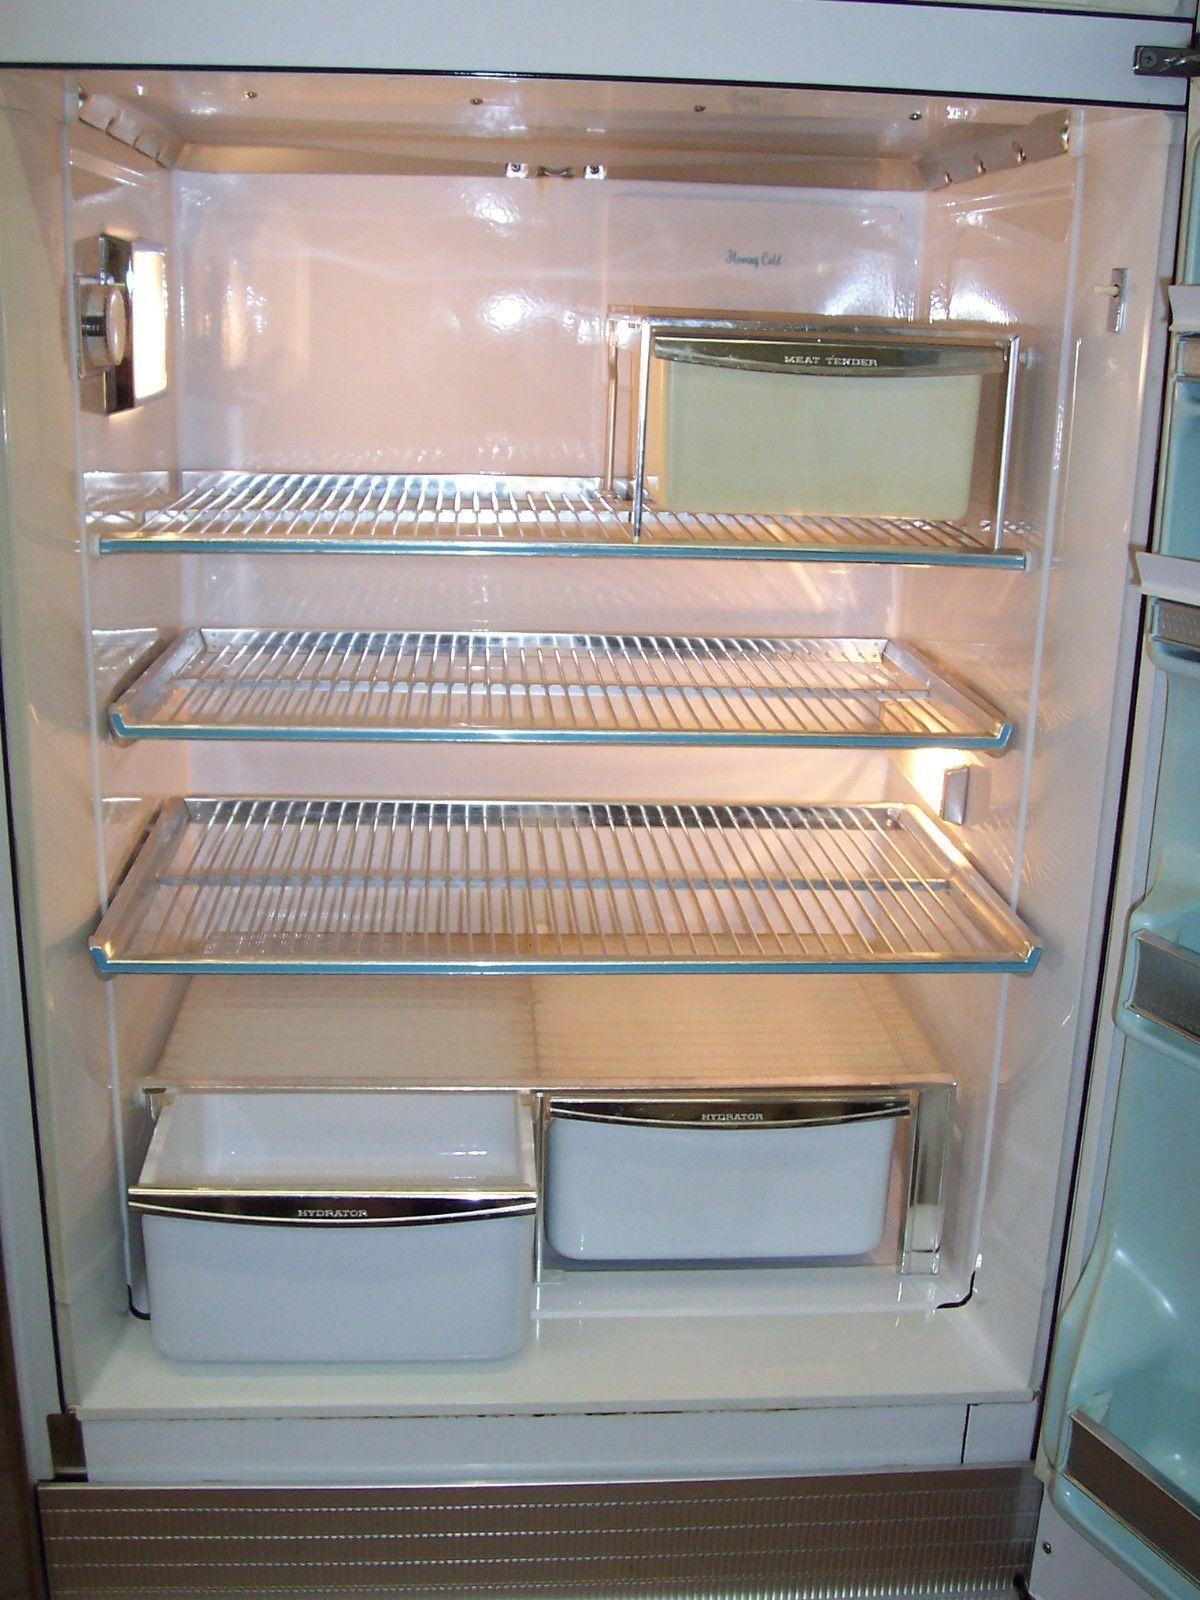 Vintage Frigidaire Imperial Refrigerator Product Of General Motors - Ebay